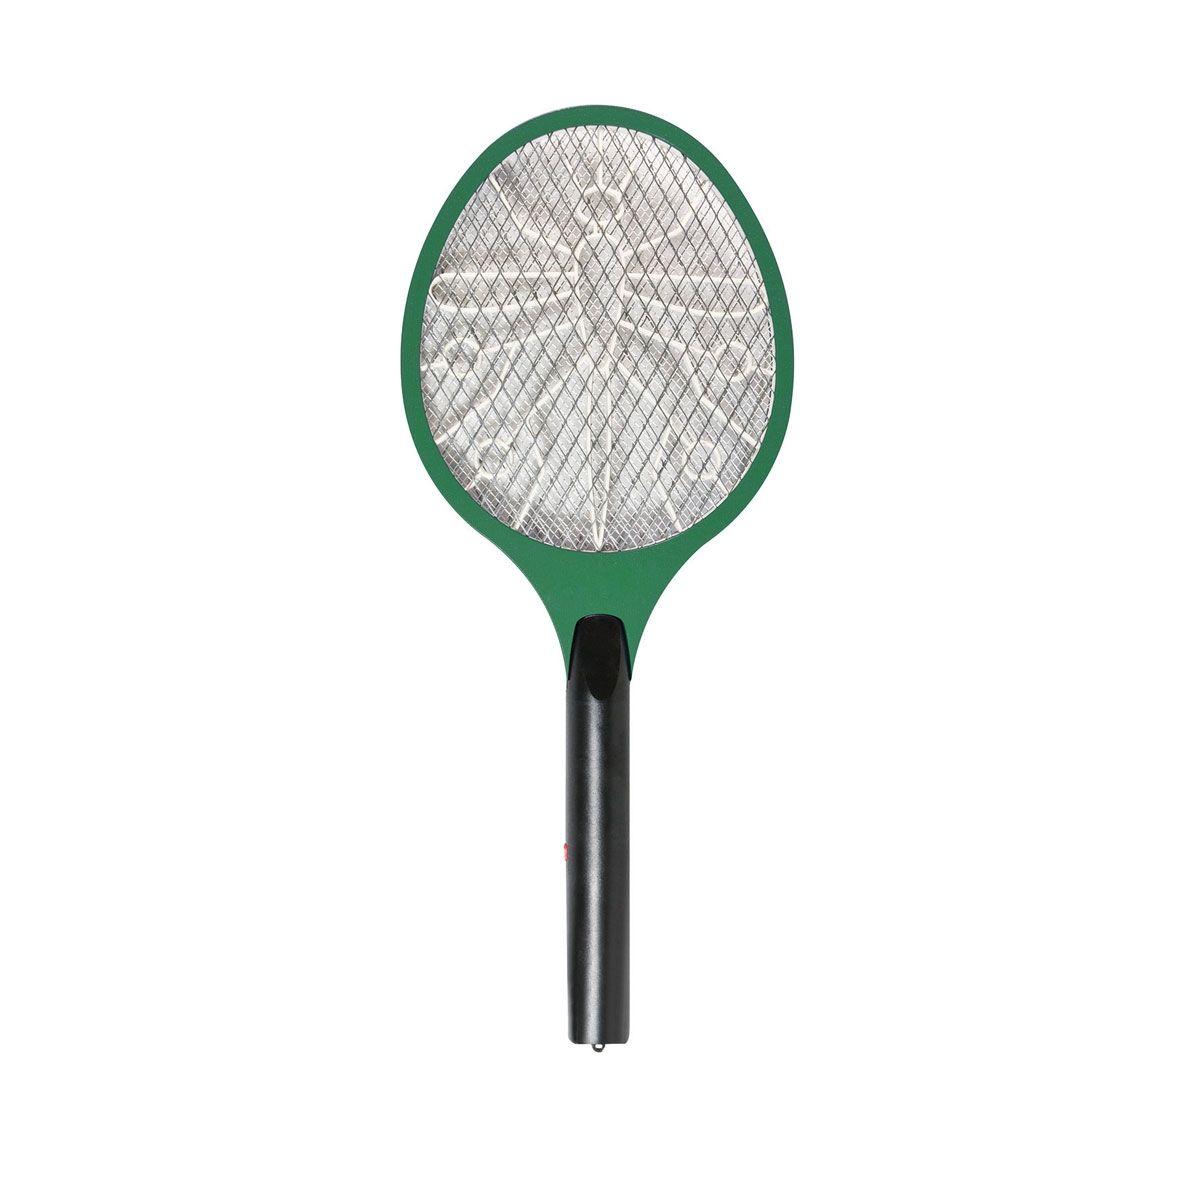 lopar-proti-mrcesu-action-racket-2860682b_606647fdc84de.jpg